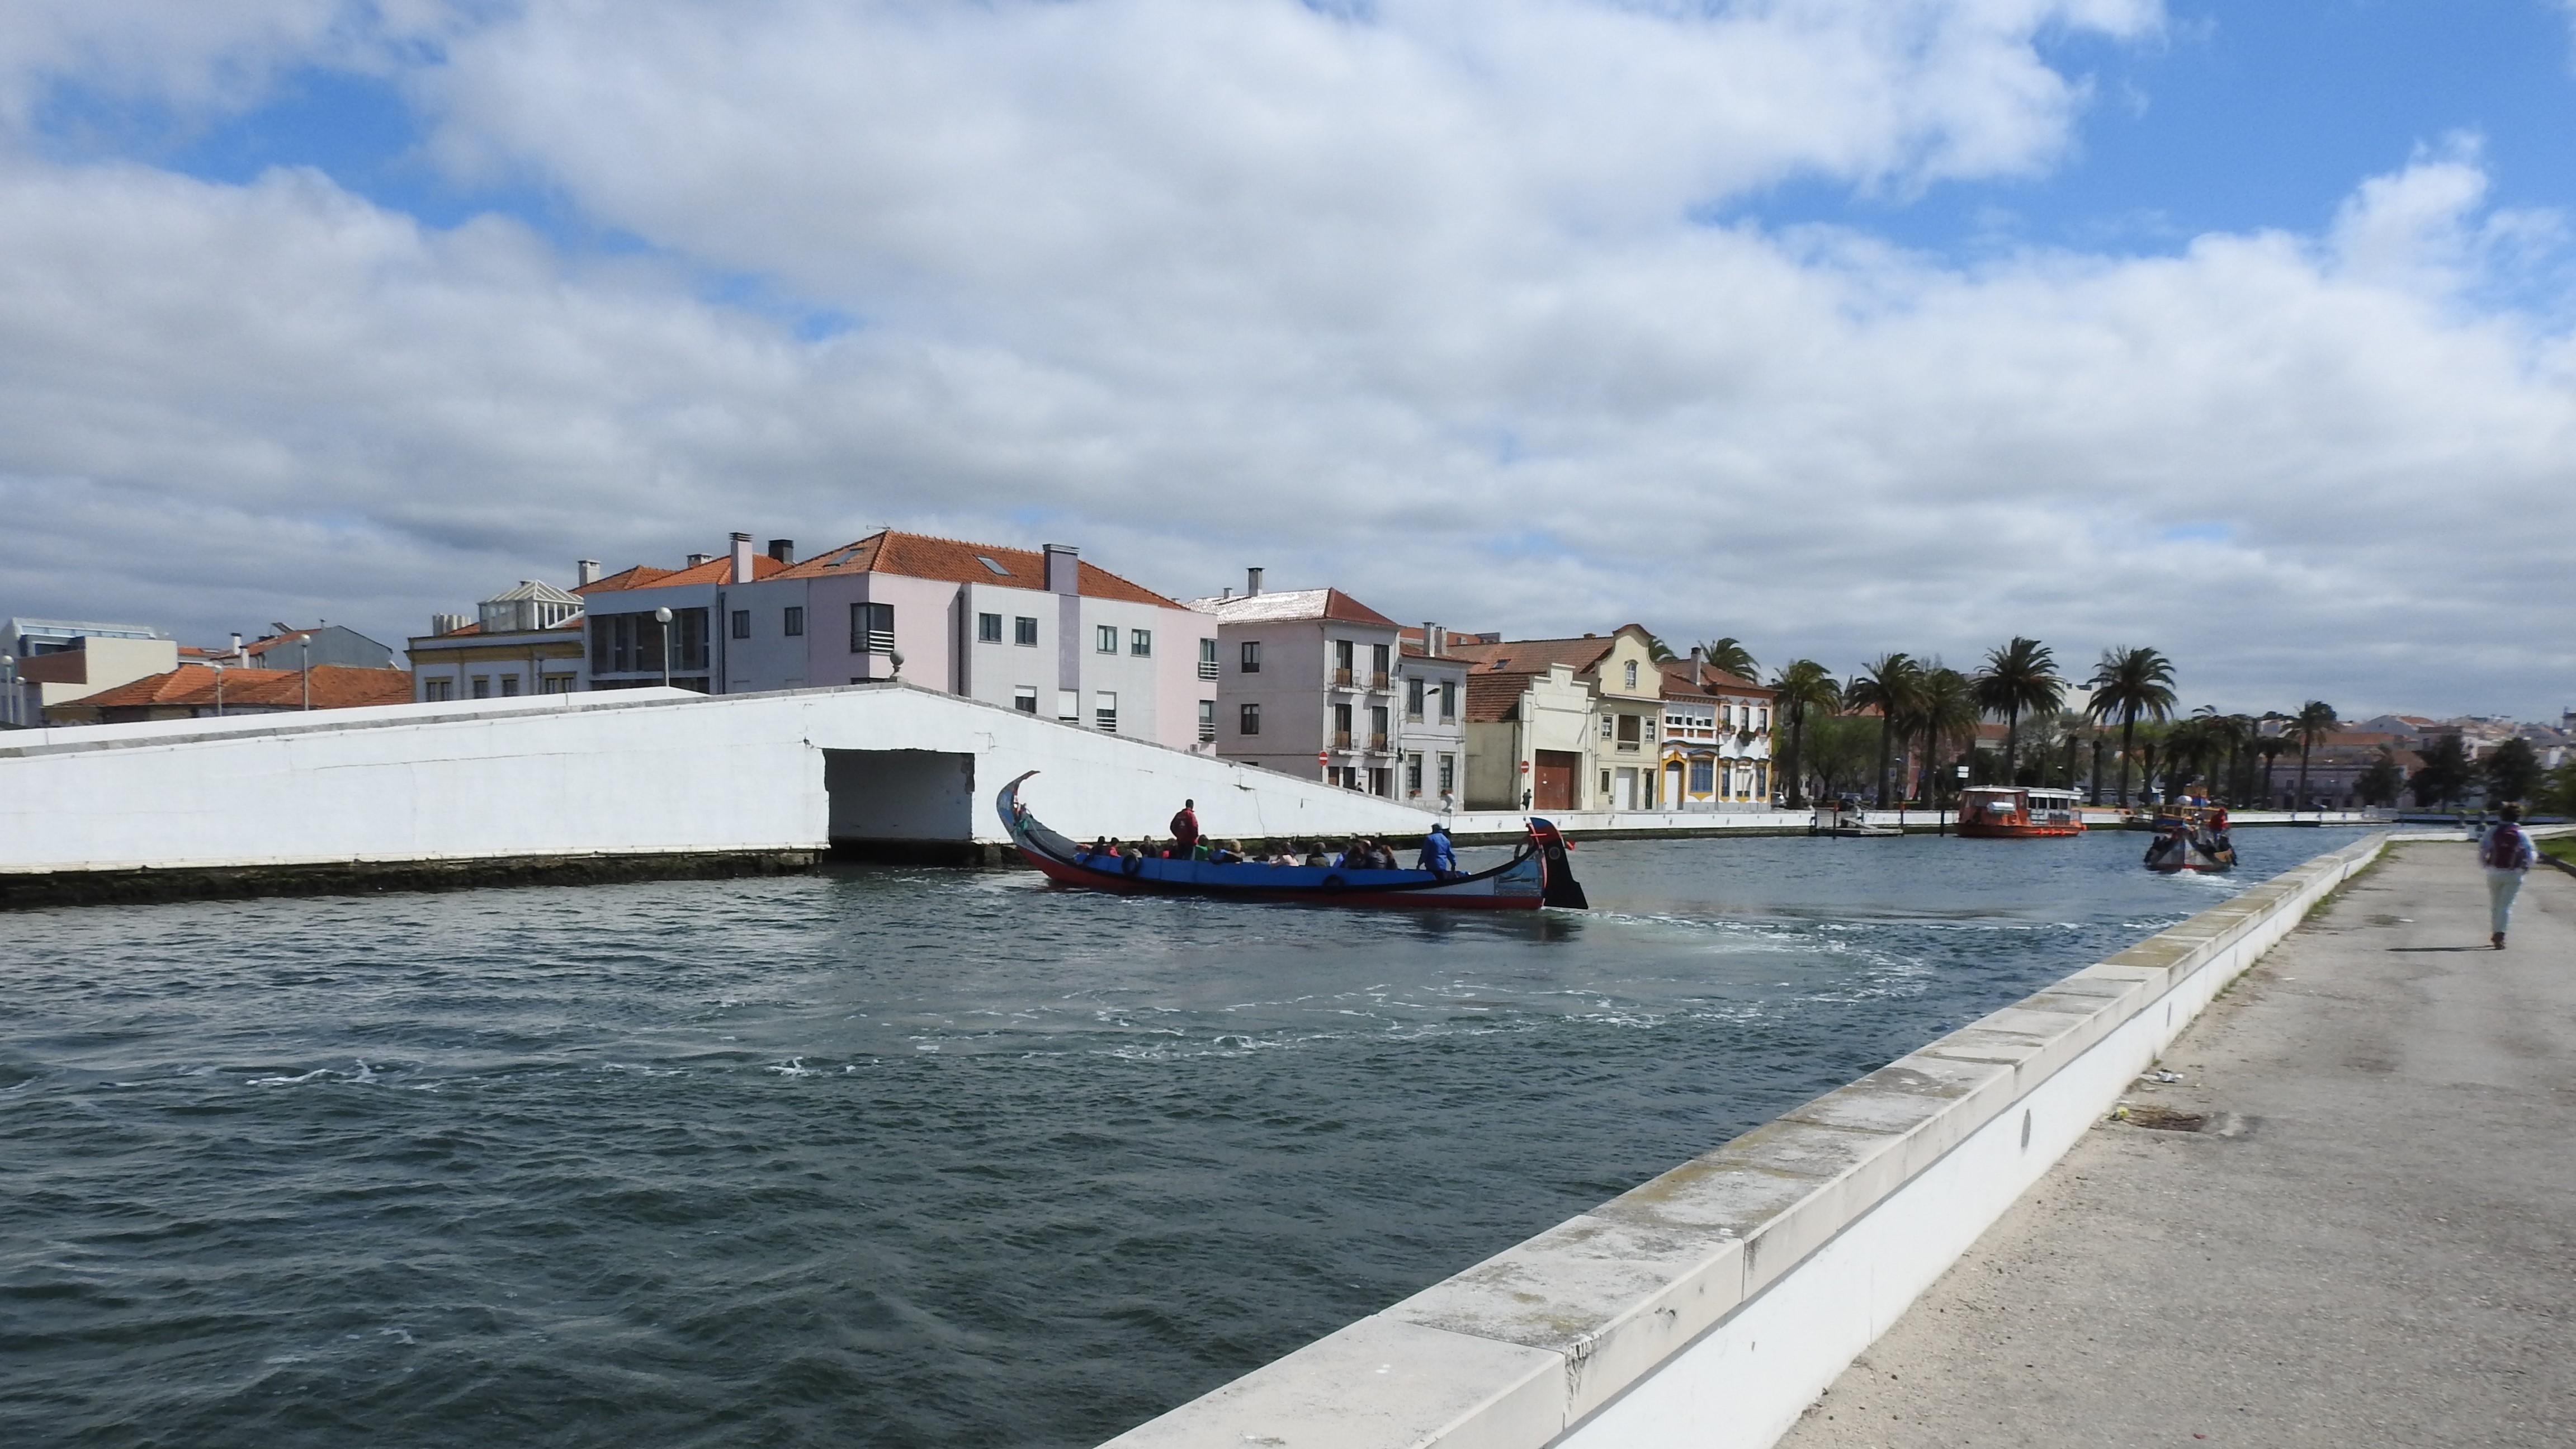 Exploring the many canals of Aveiro